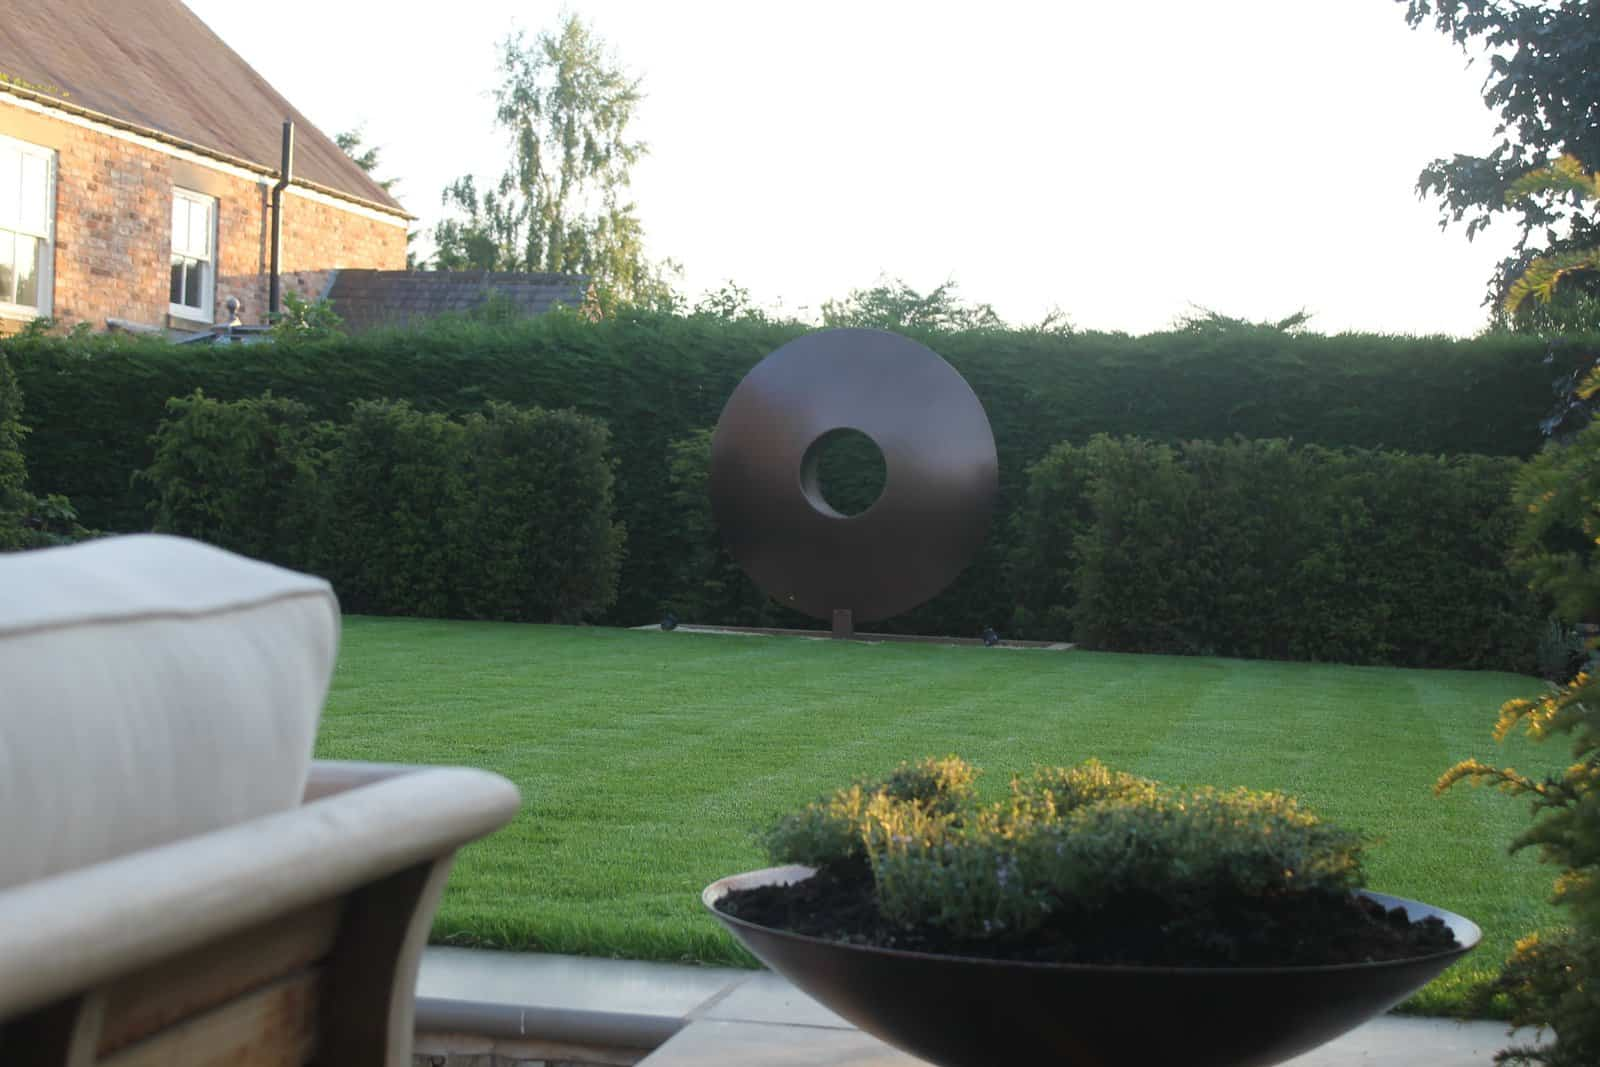 Views - Outdoor Gas Fire Pit - Outdoor sofas - The Bestall Collection - Bestall & Co Landscape Design - Taxus Columns - Sawn Sandstone Paving - Garden Designer Yorkshire - Bowl Planter - Tyme In Planter - Taxus Hedge - Planting Design - Garden Sculpture - Garden Focal Point - Sunken Garden - The Perfect Lawn